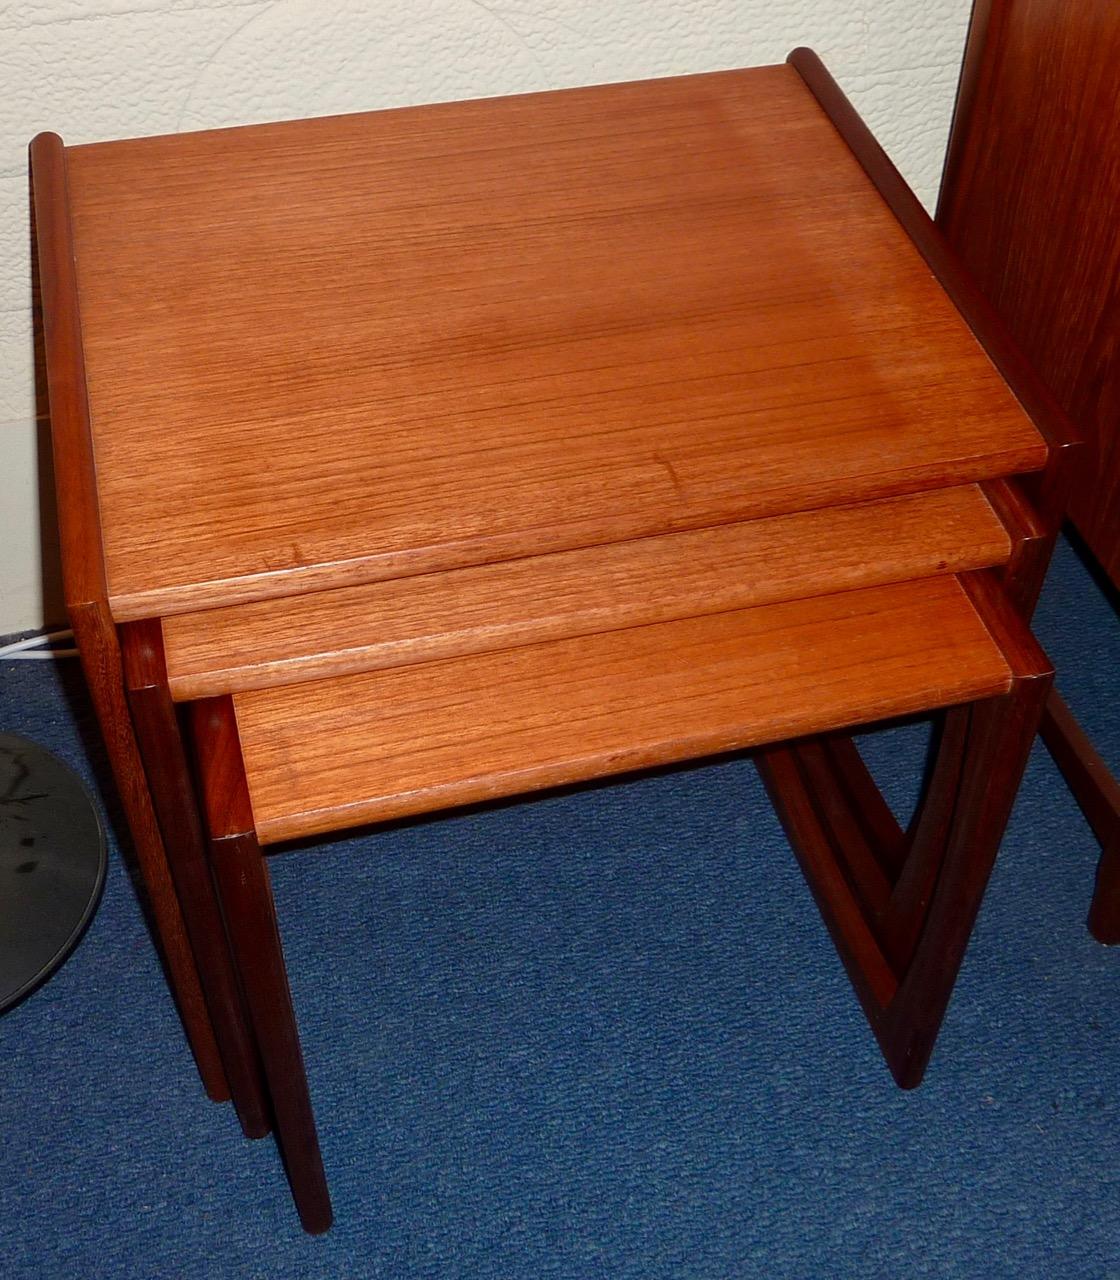 English G Plan Nest of 3 Teak & Afrormosia Tables-2.jpg